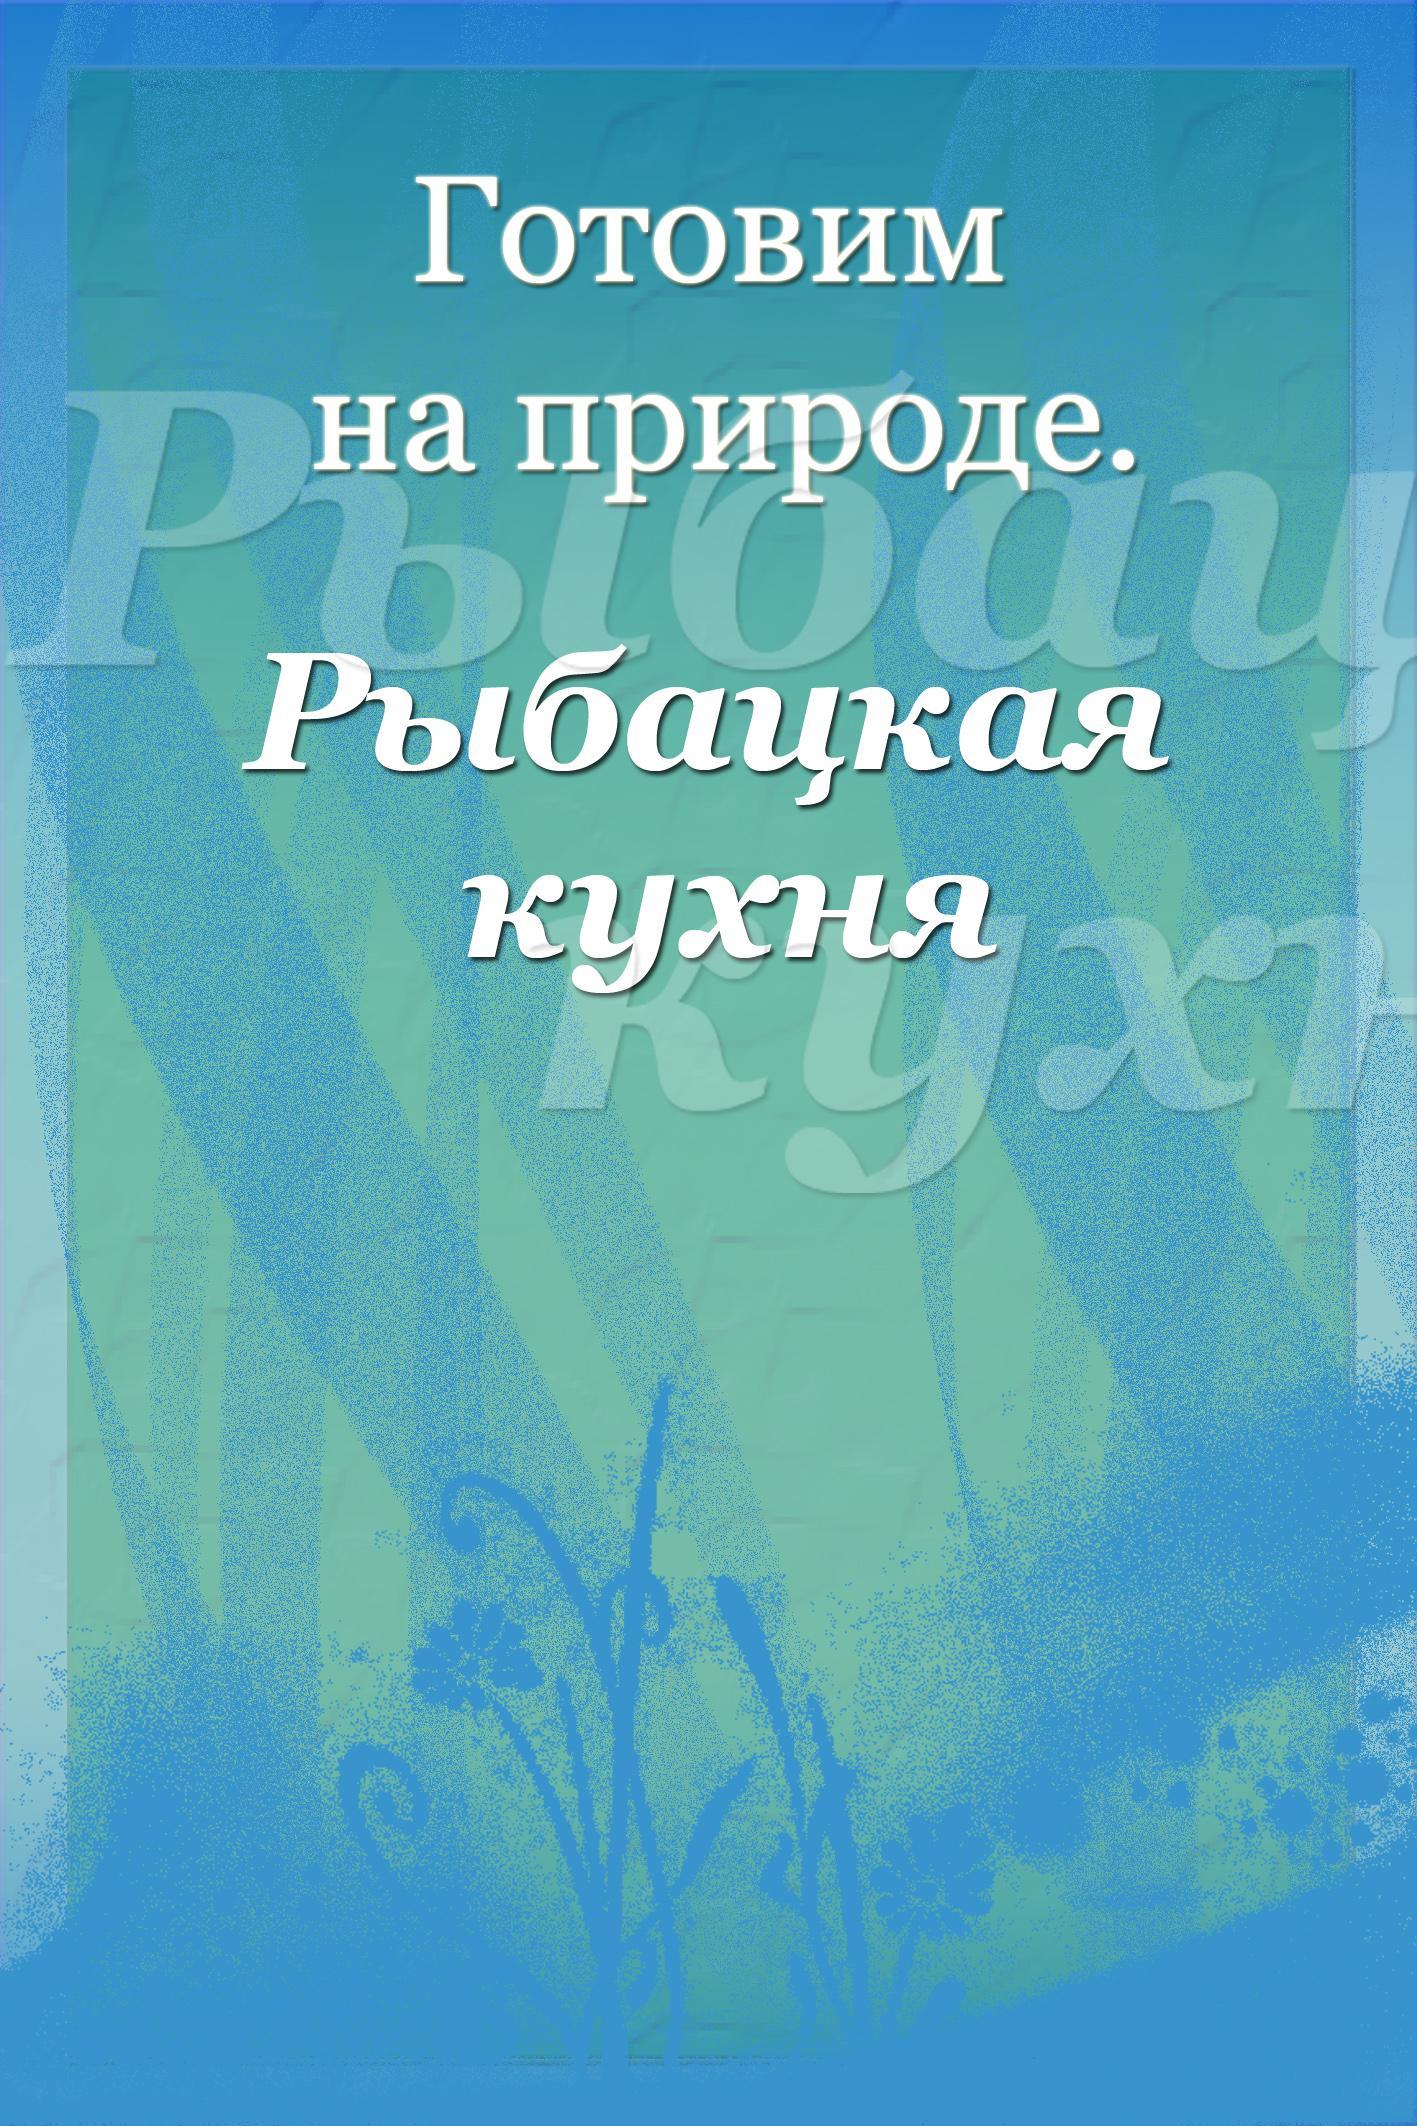 Илья Мельников Рыбацкая кухня илья мельников рыбацкая кухня